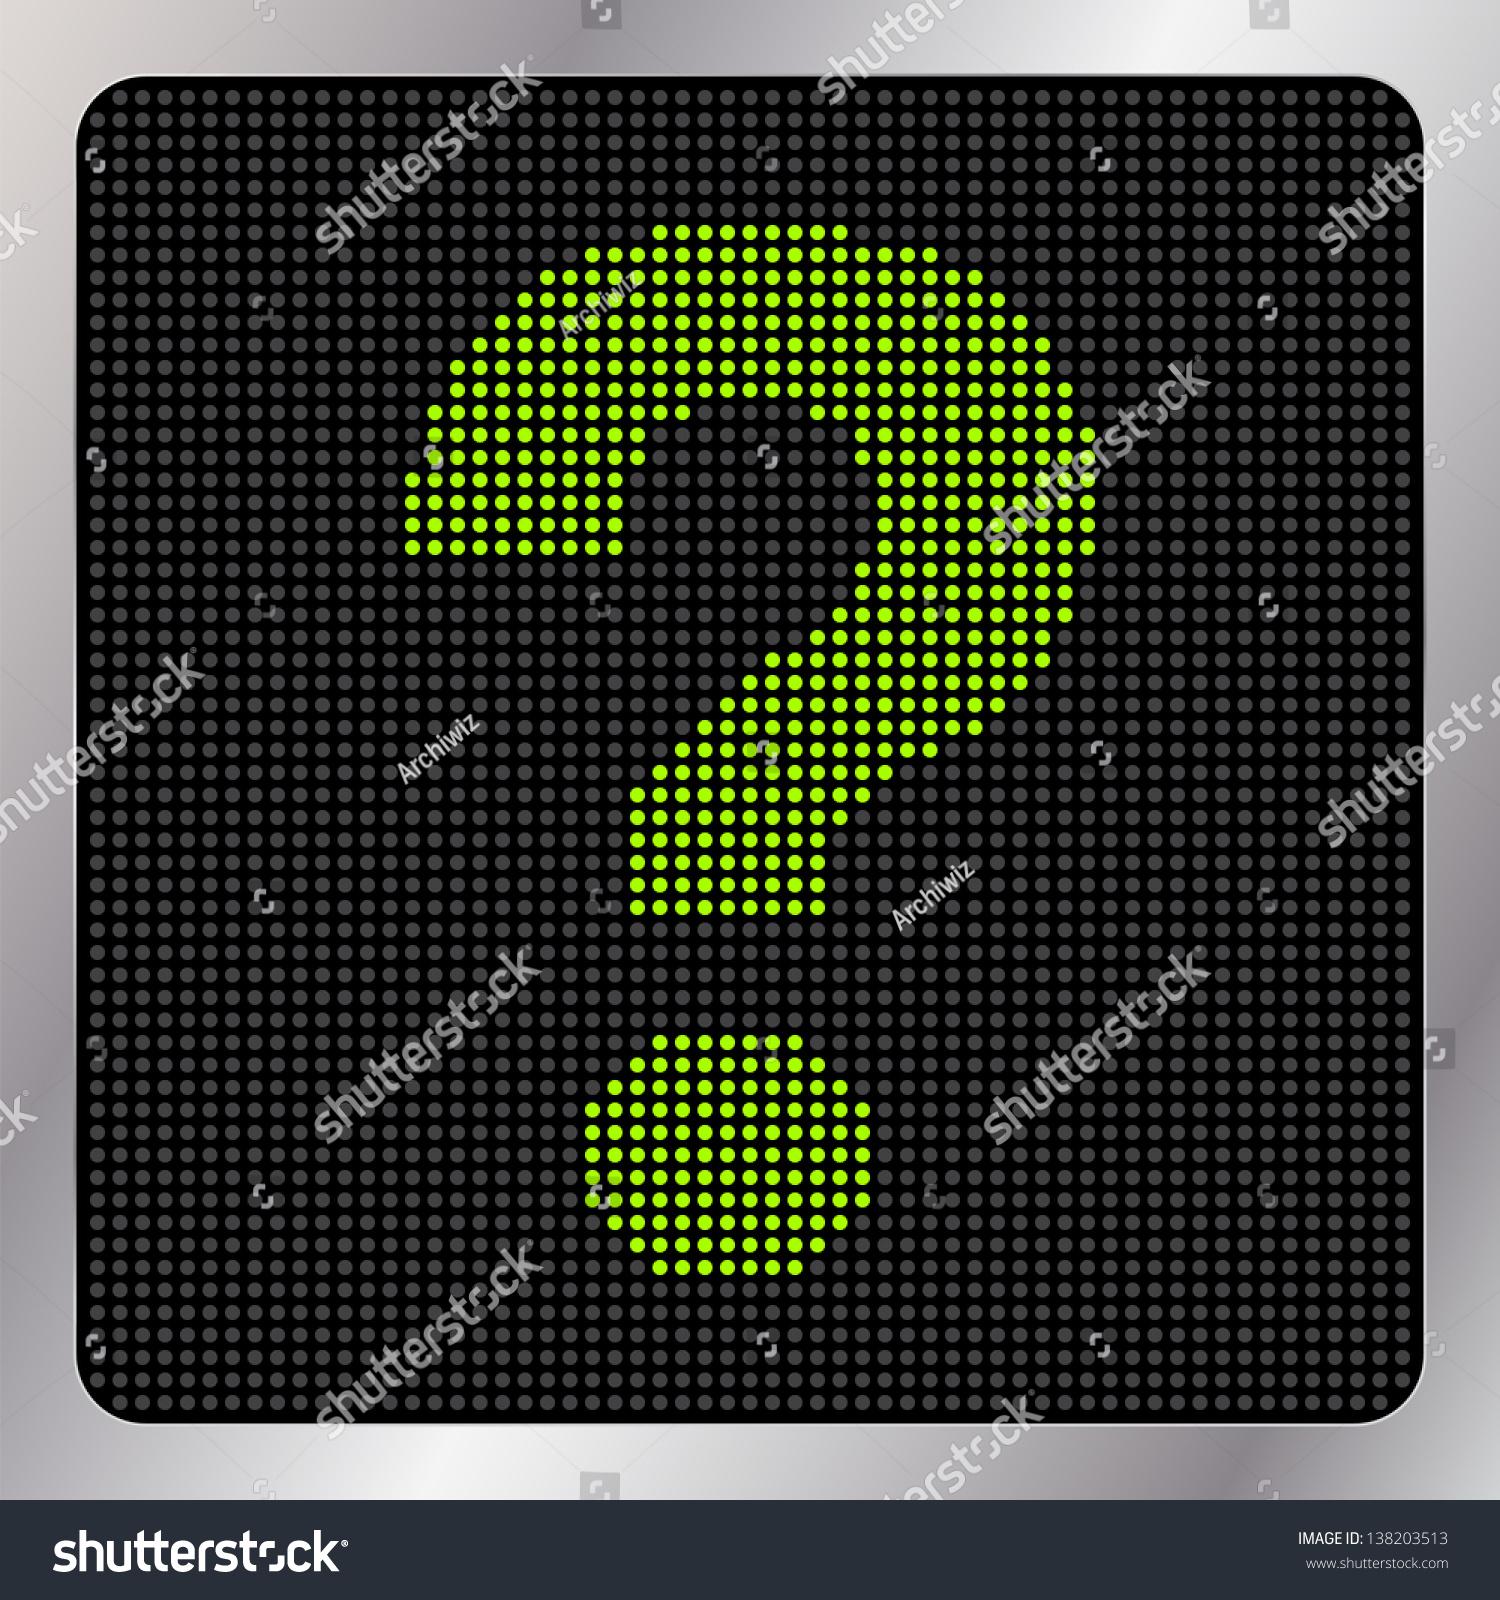 Graphic Design question?